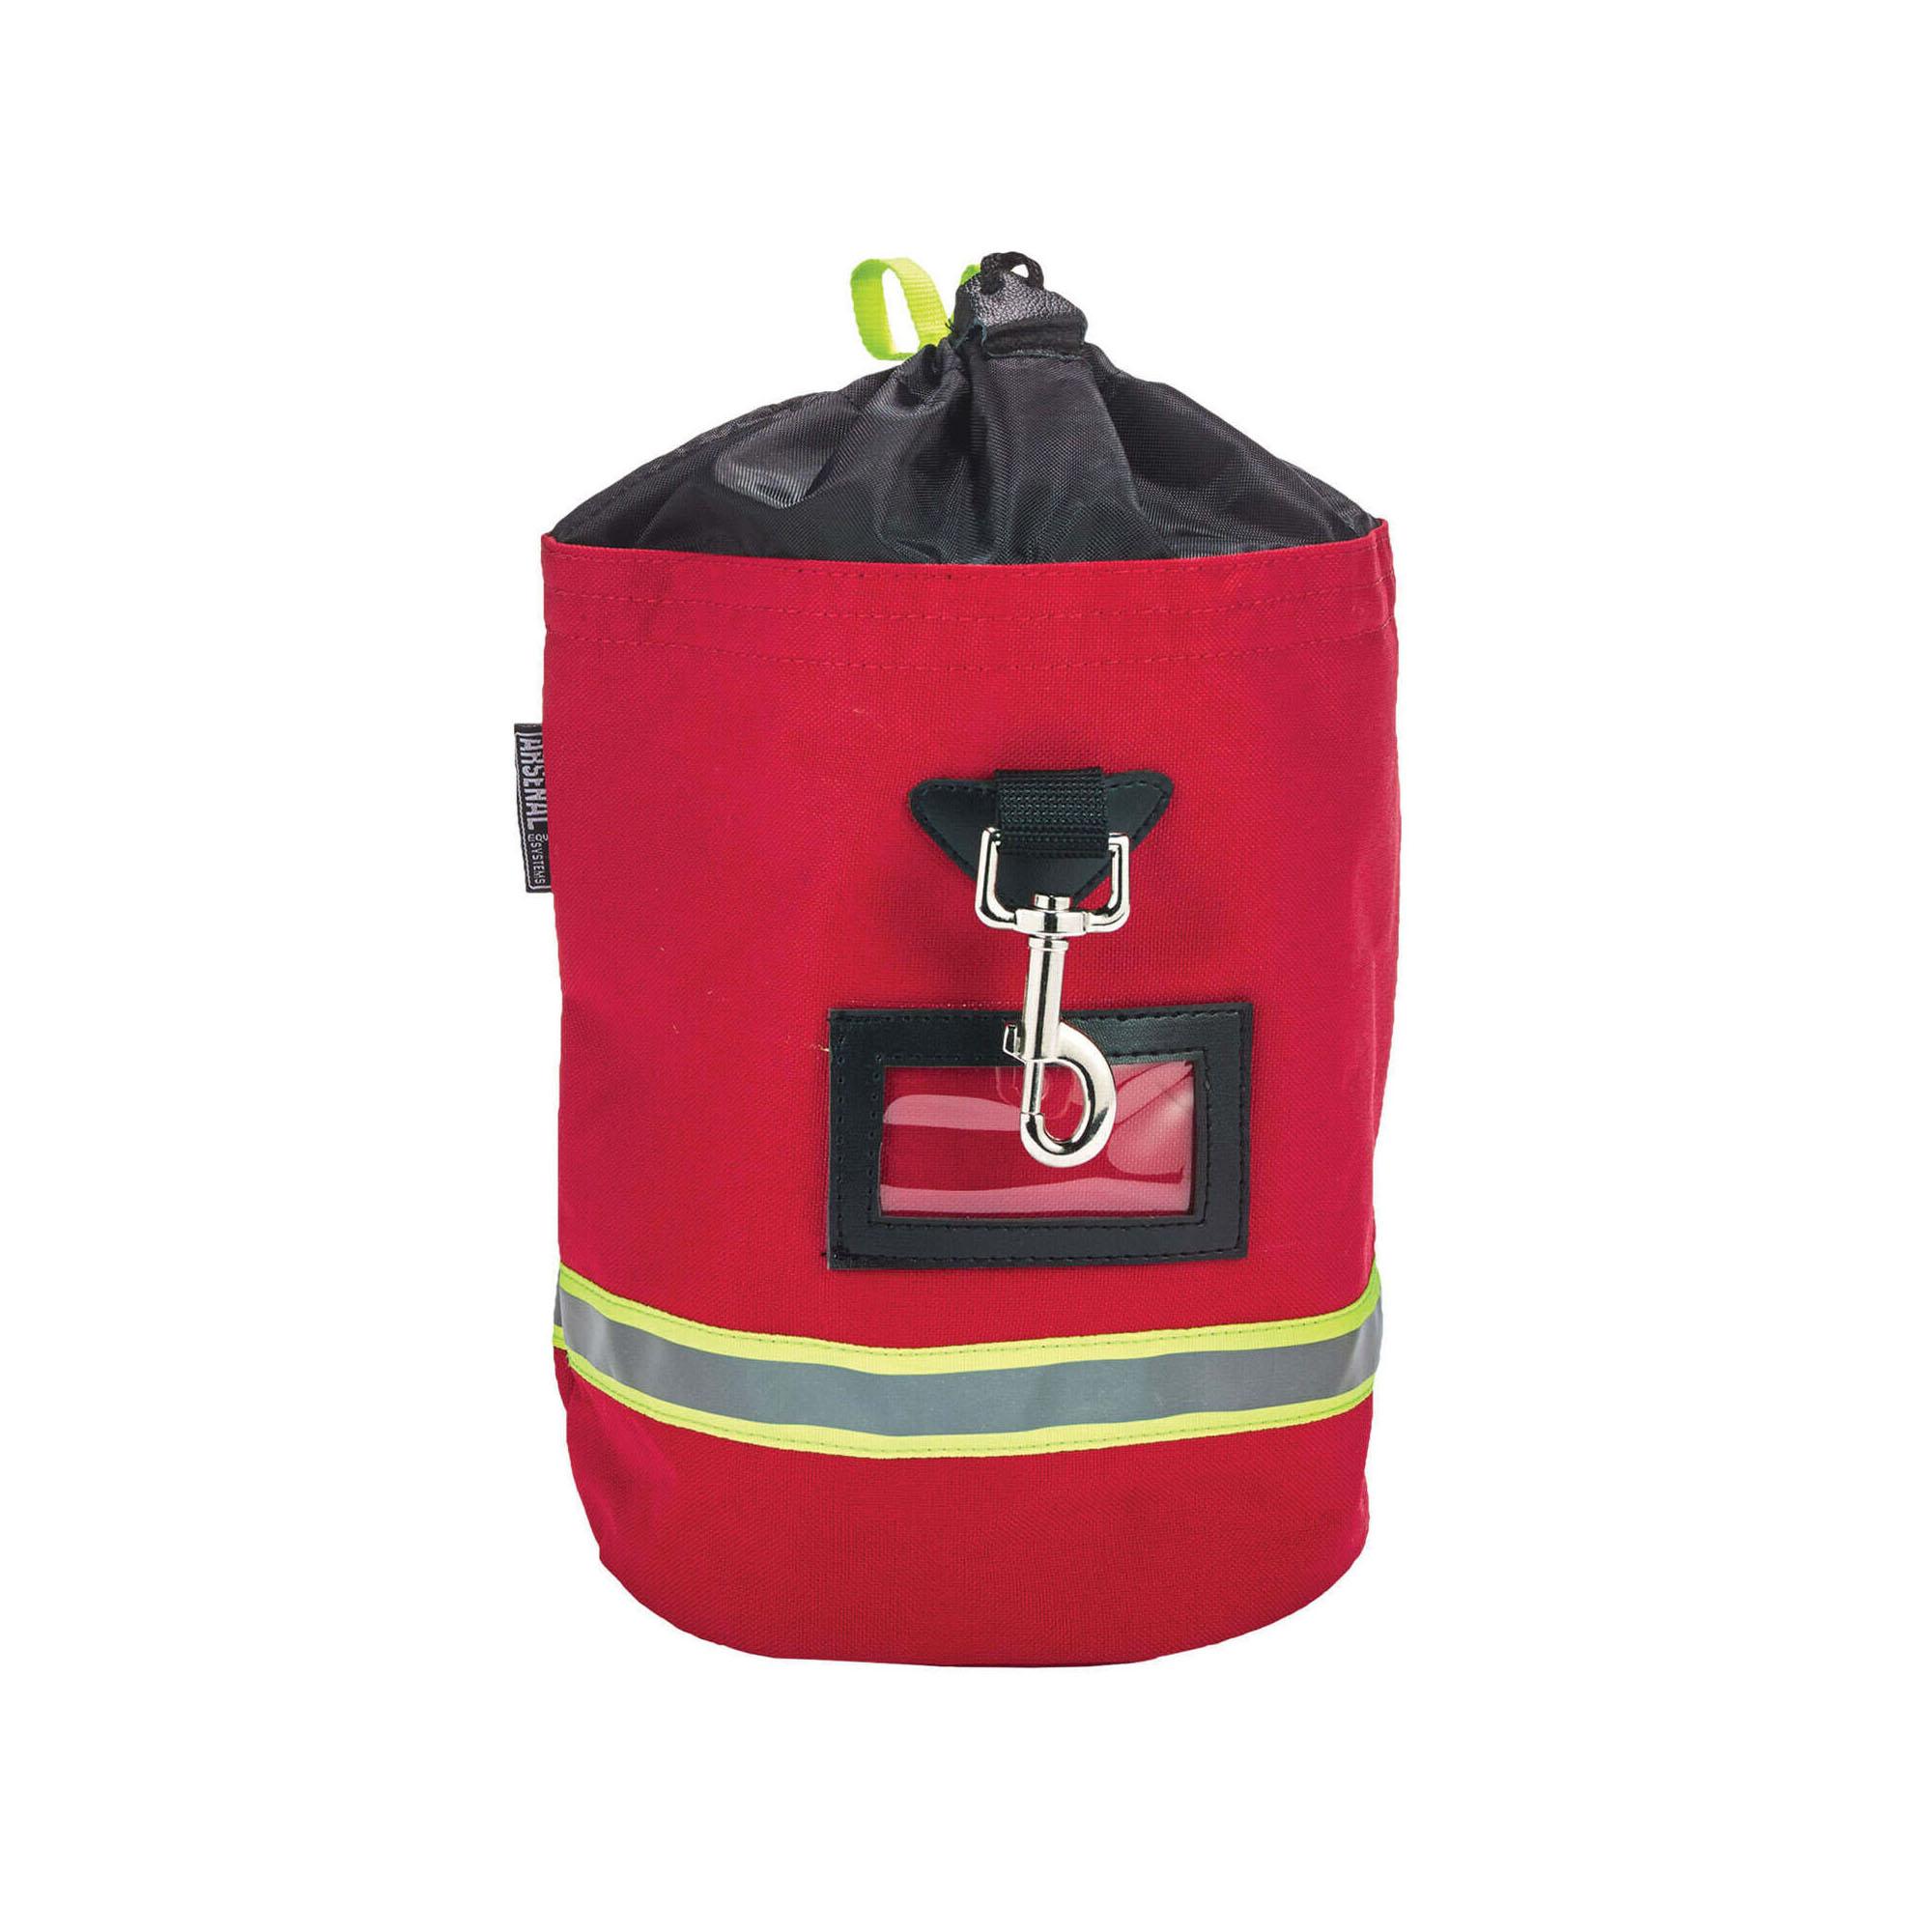 Arsenal® 13060 5060 Step-In Combo Gear Bag, Red, 1000D Nylon, 6750 cu-in Storage, 15 in H x 15 in W x 29 in D